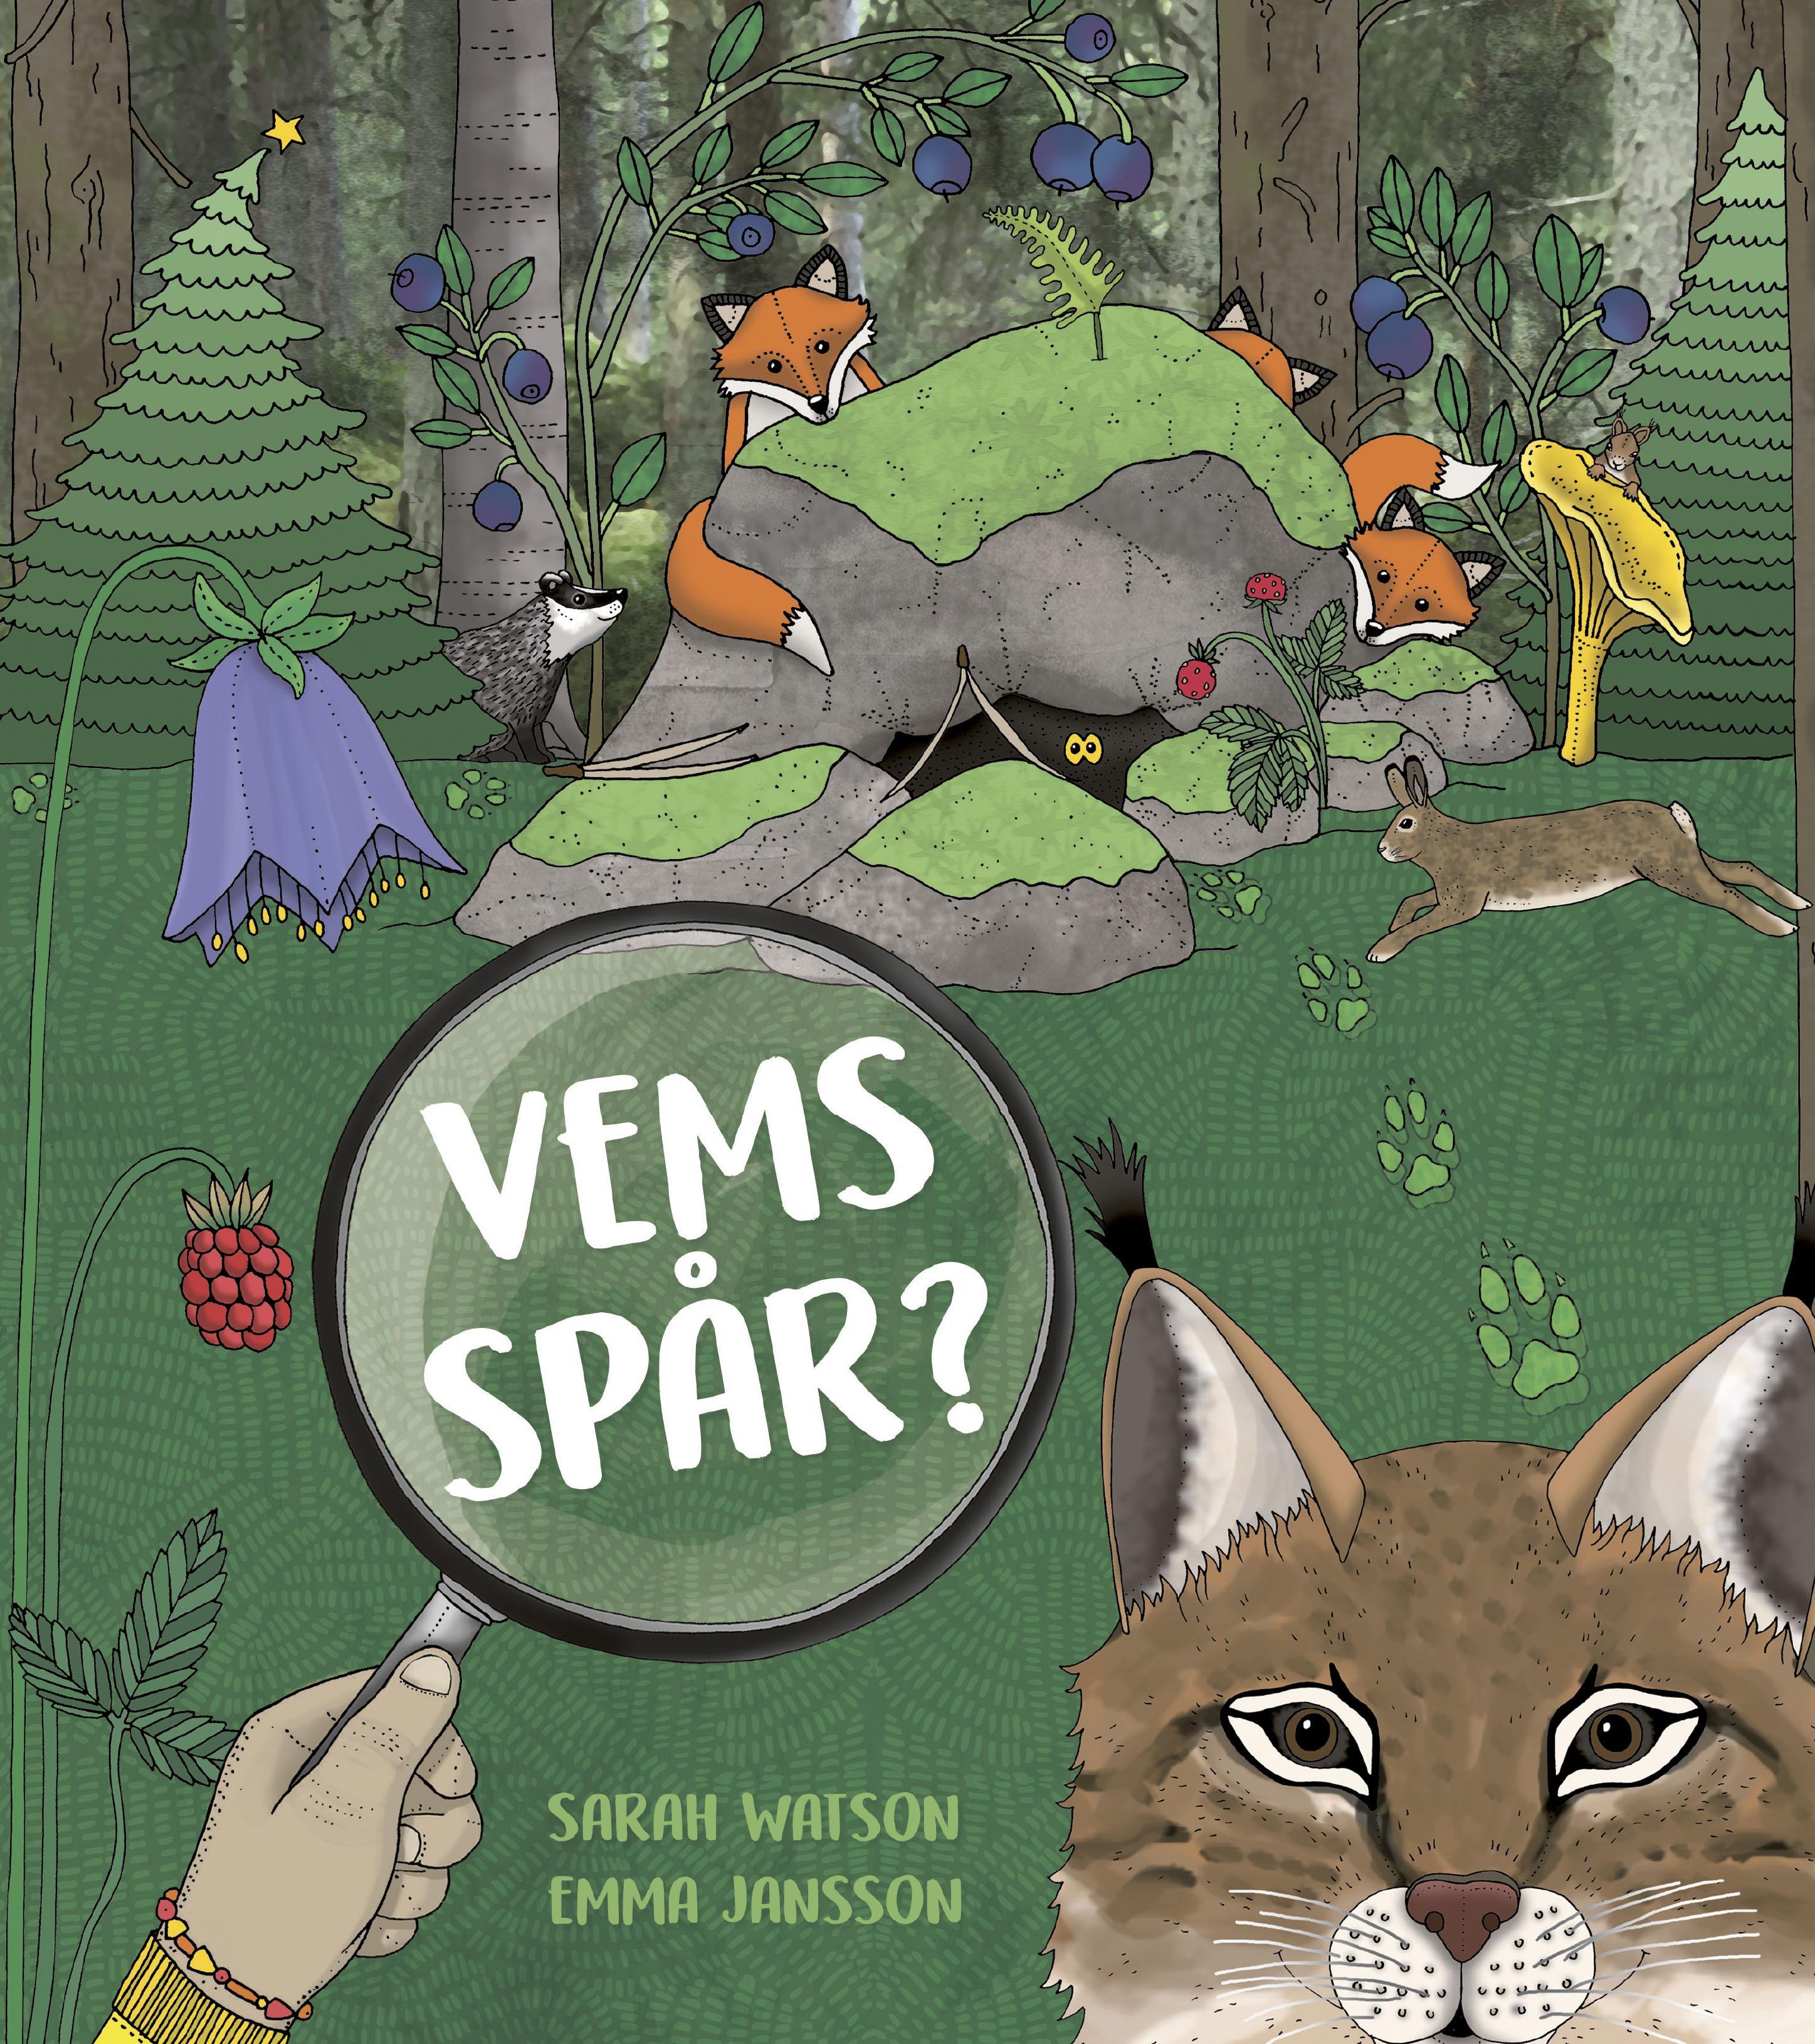 Vems spår? av Sarah Watson & Emma Jansson